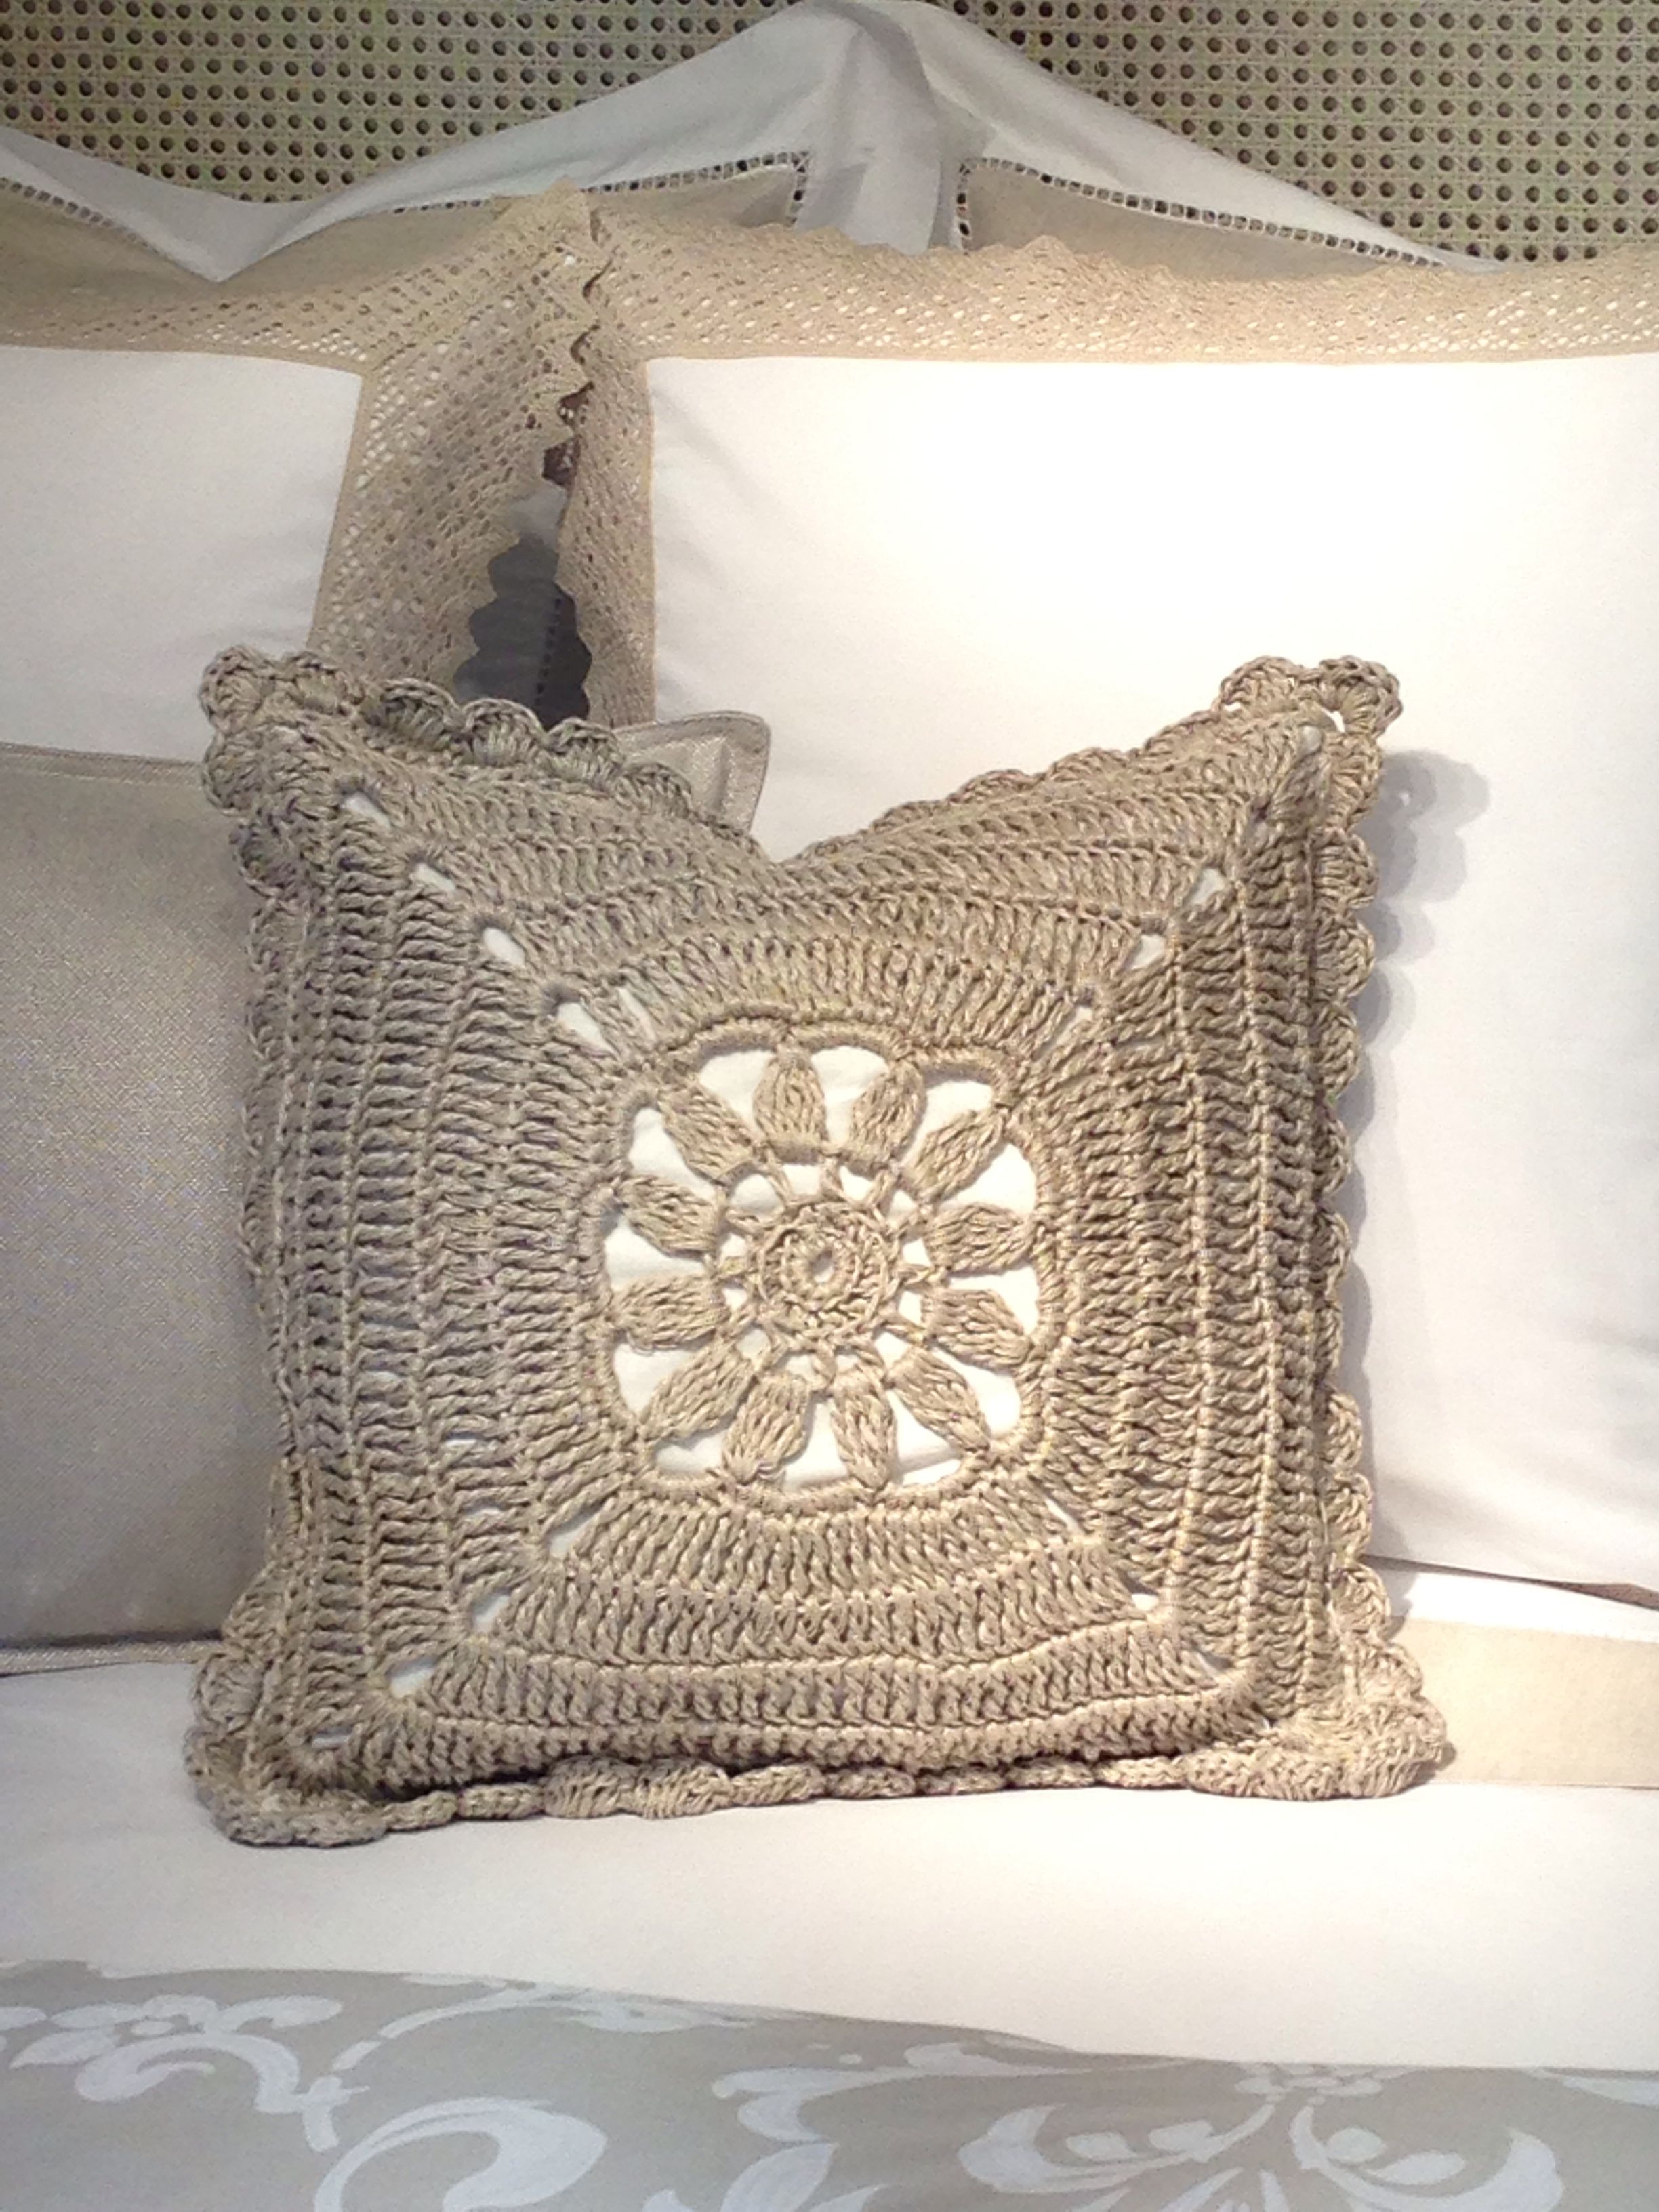 Zara Home Cojines Y Mantas.Crochet Cushion Zara Home Diy Pillow Covers Crochet